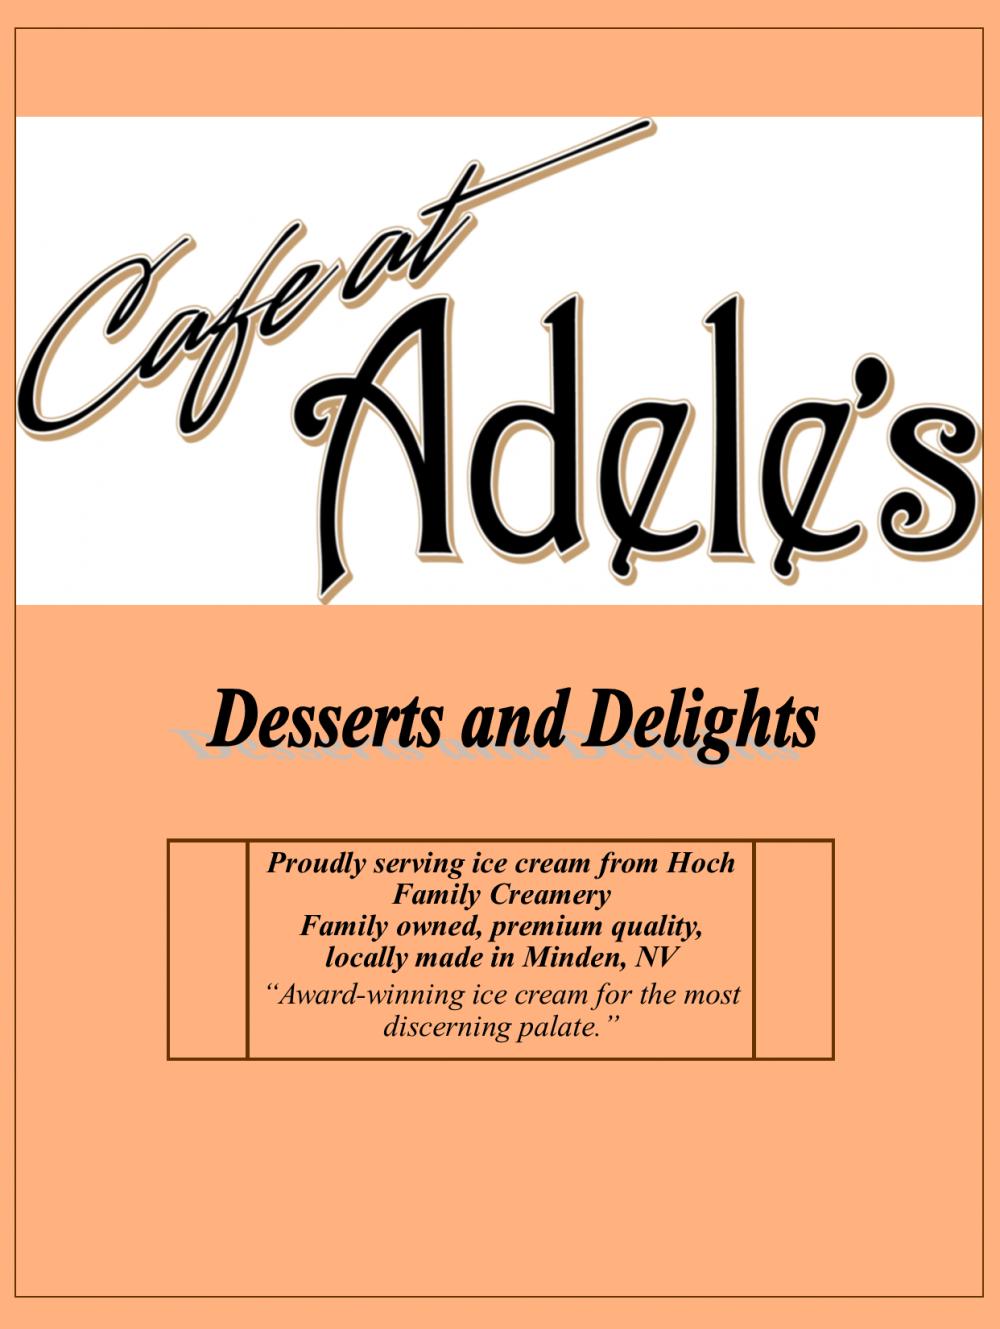 DessertDelights2016 June Page 1